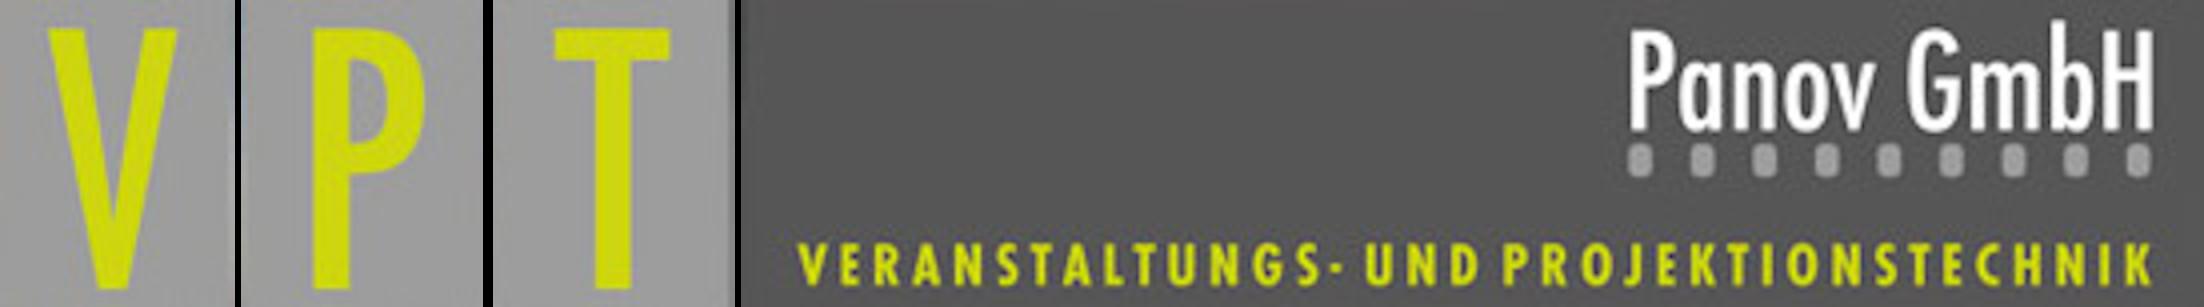 VPT Panov GmbH